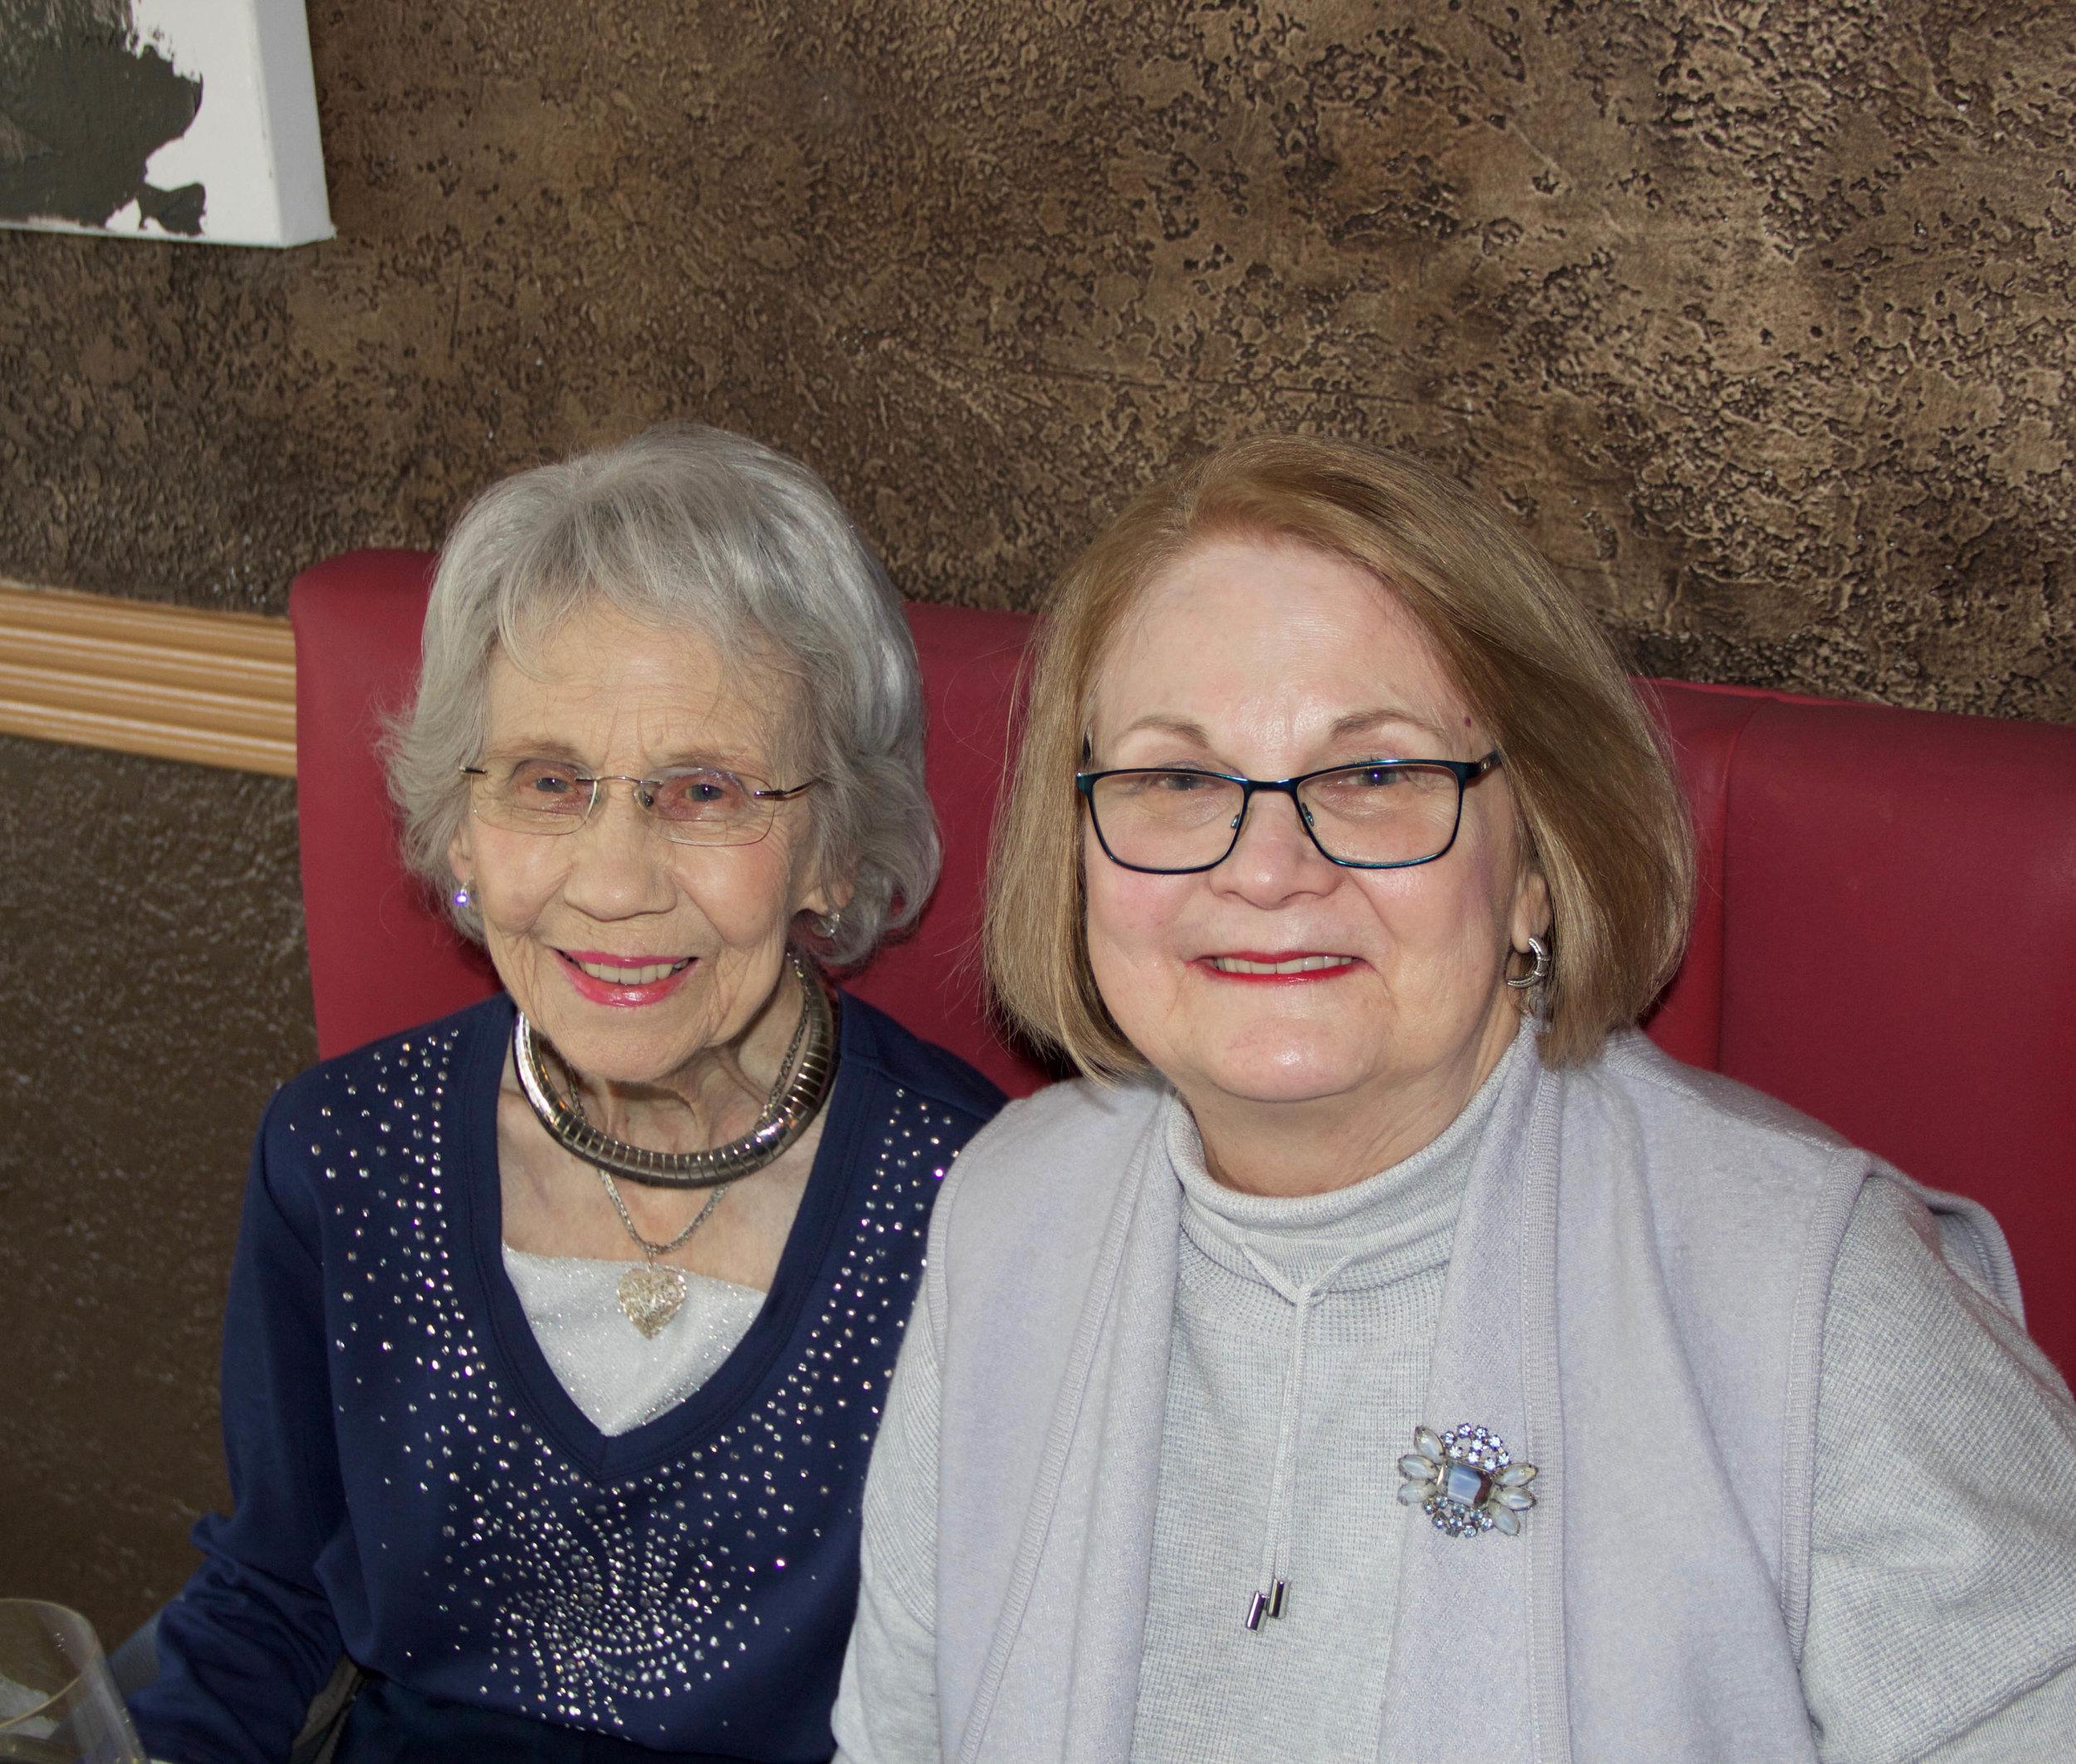 Lynne Vammen and Carol Ann Sanderson